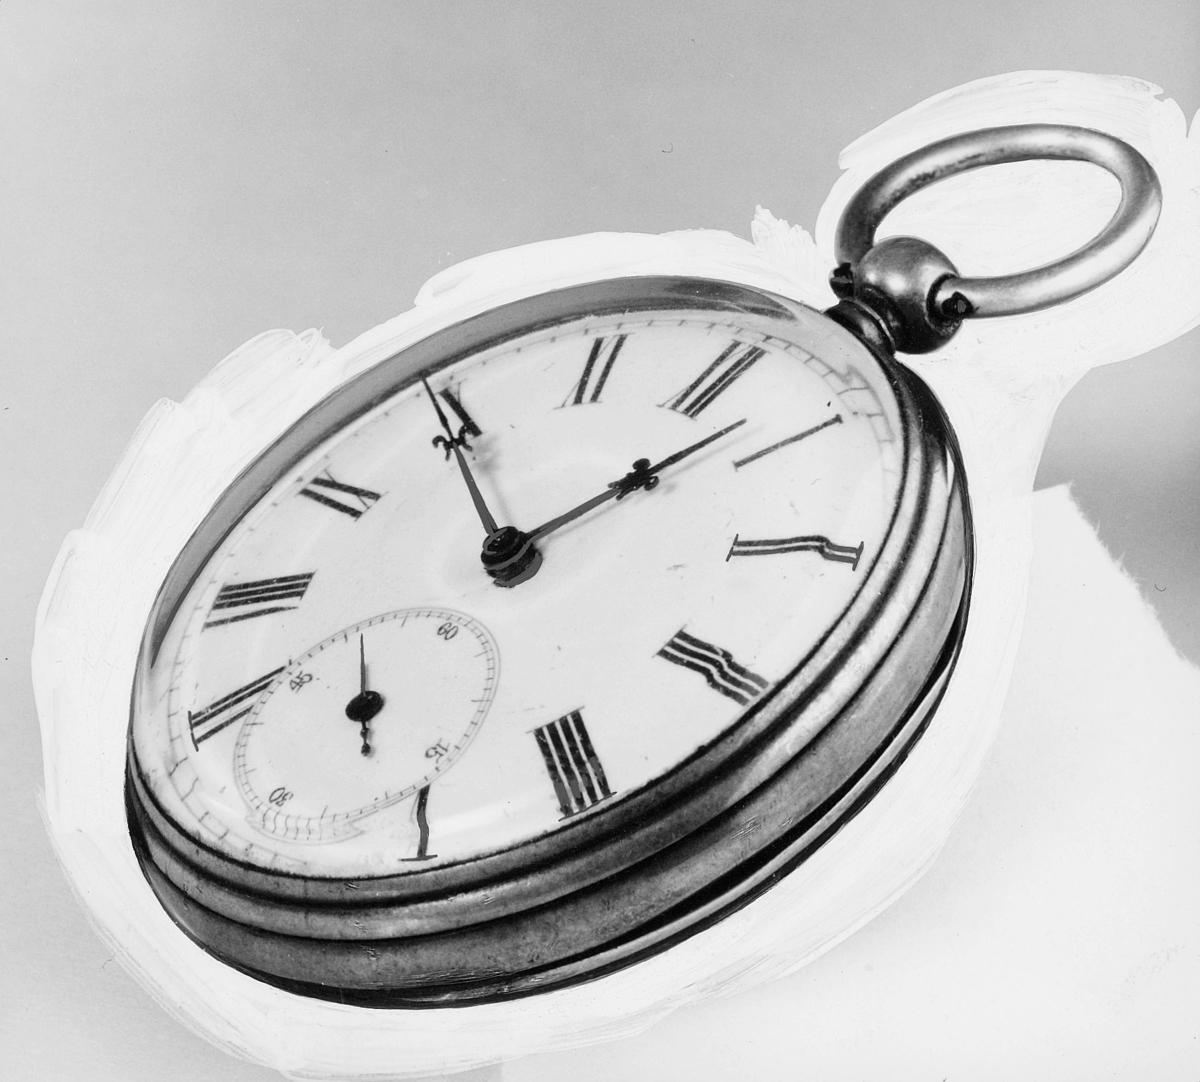 postmuseet, gjenstander, klokke, postførerur